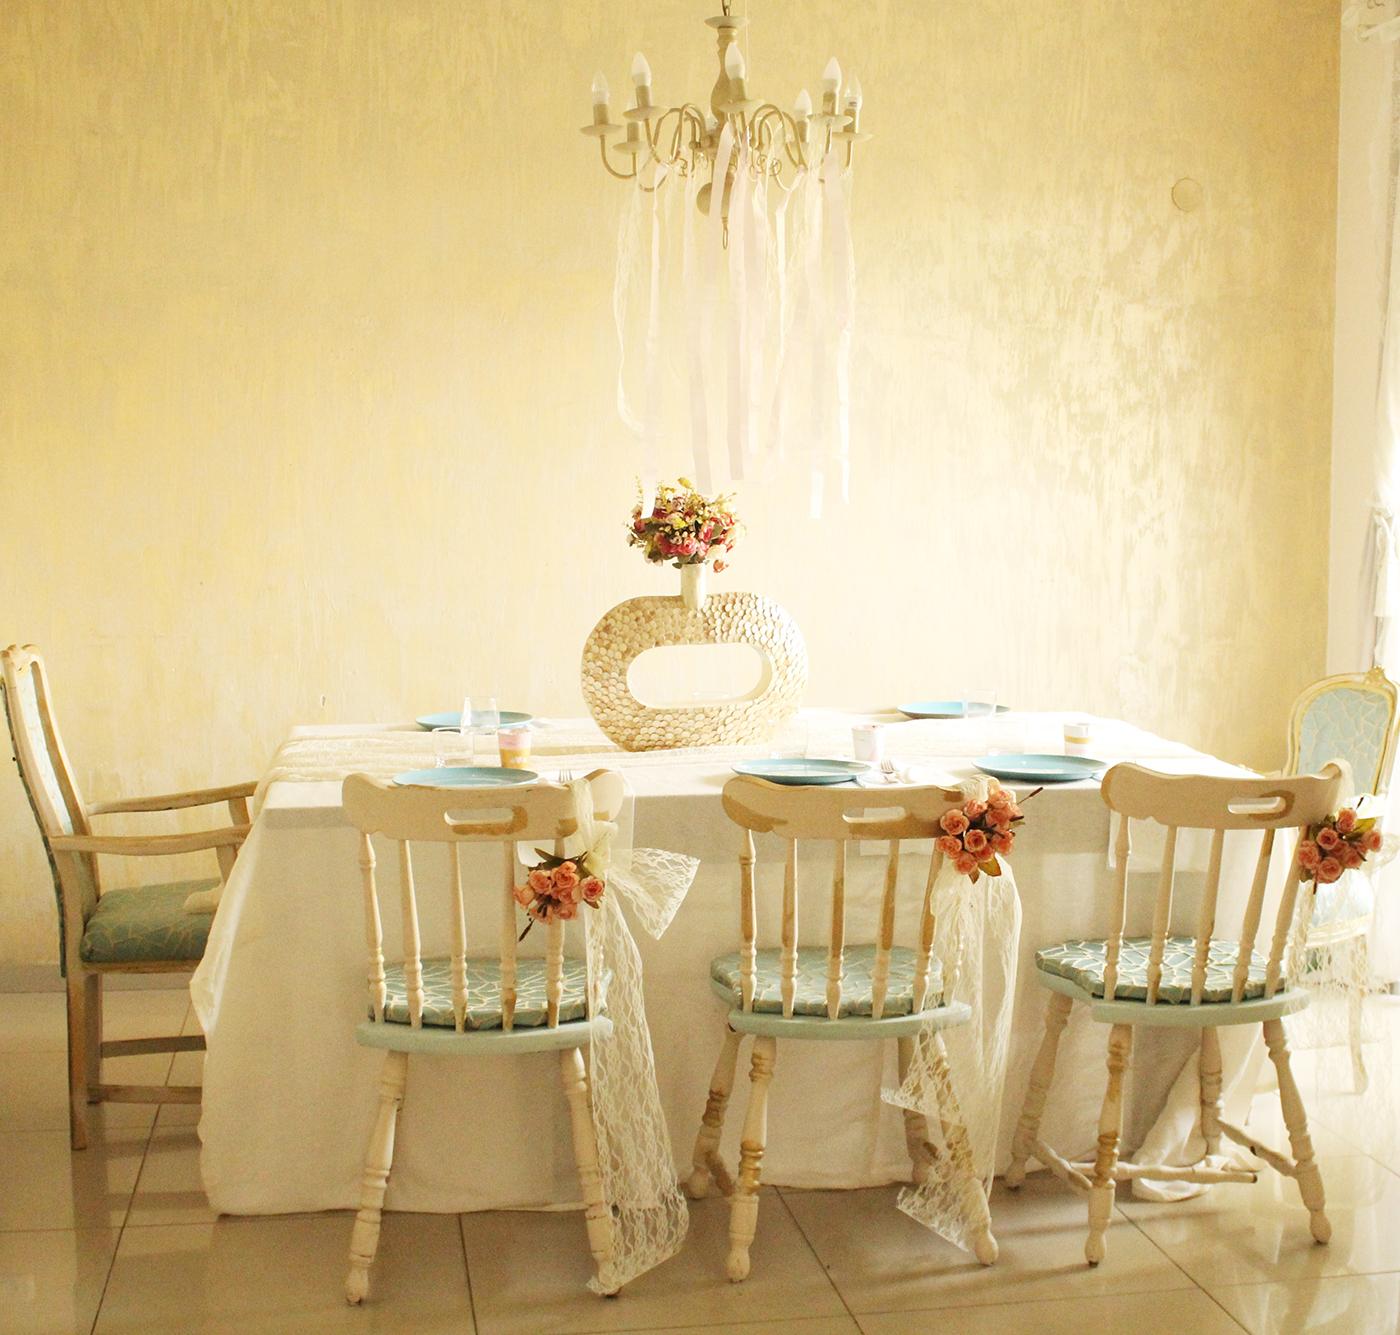 IMG 8109 - חידוש כסאות לפינת אוכל בסלון